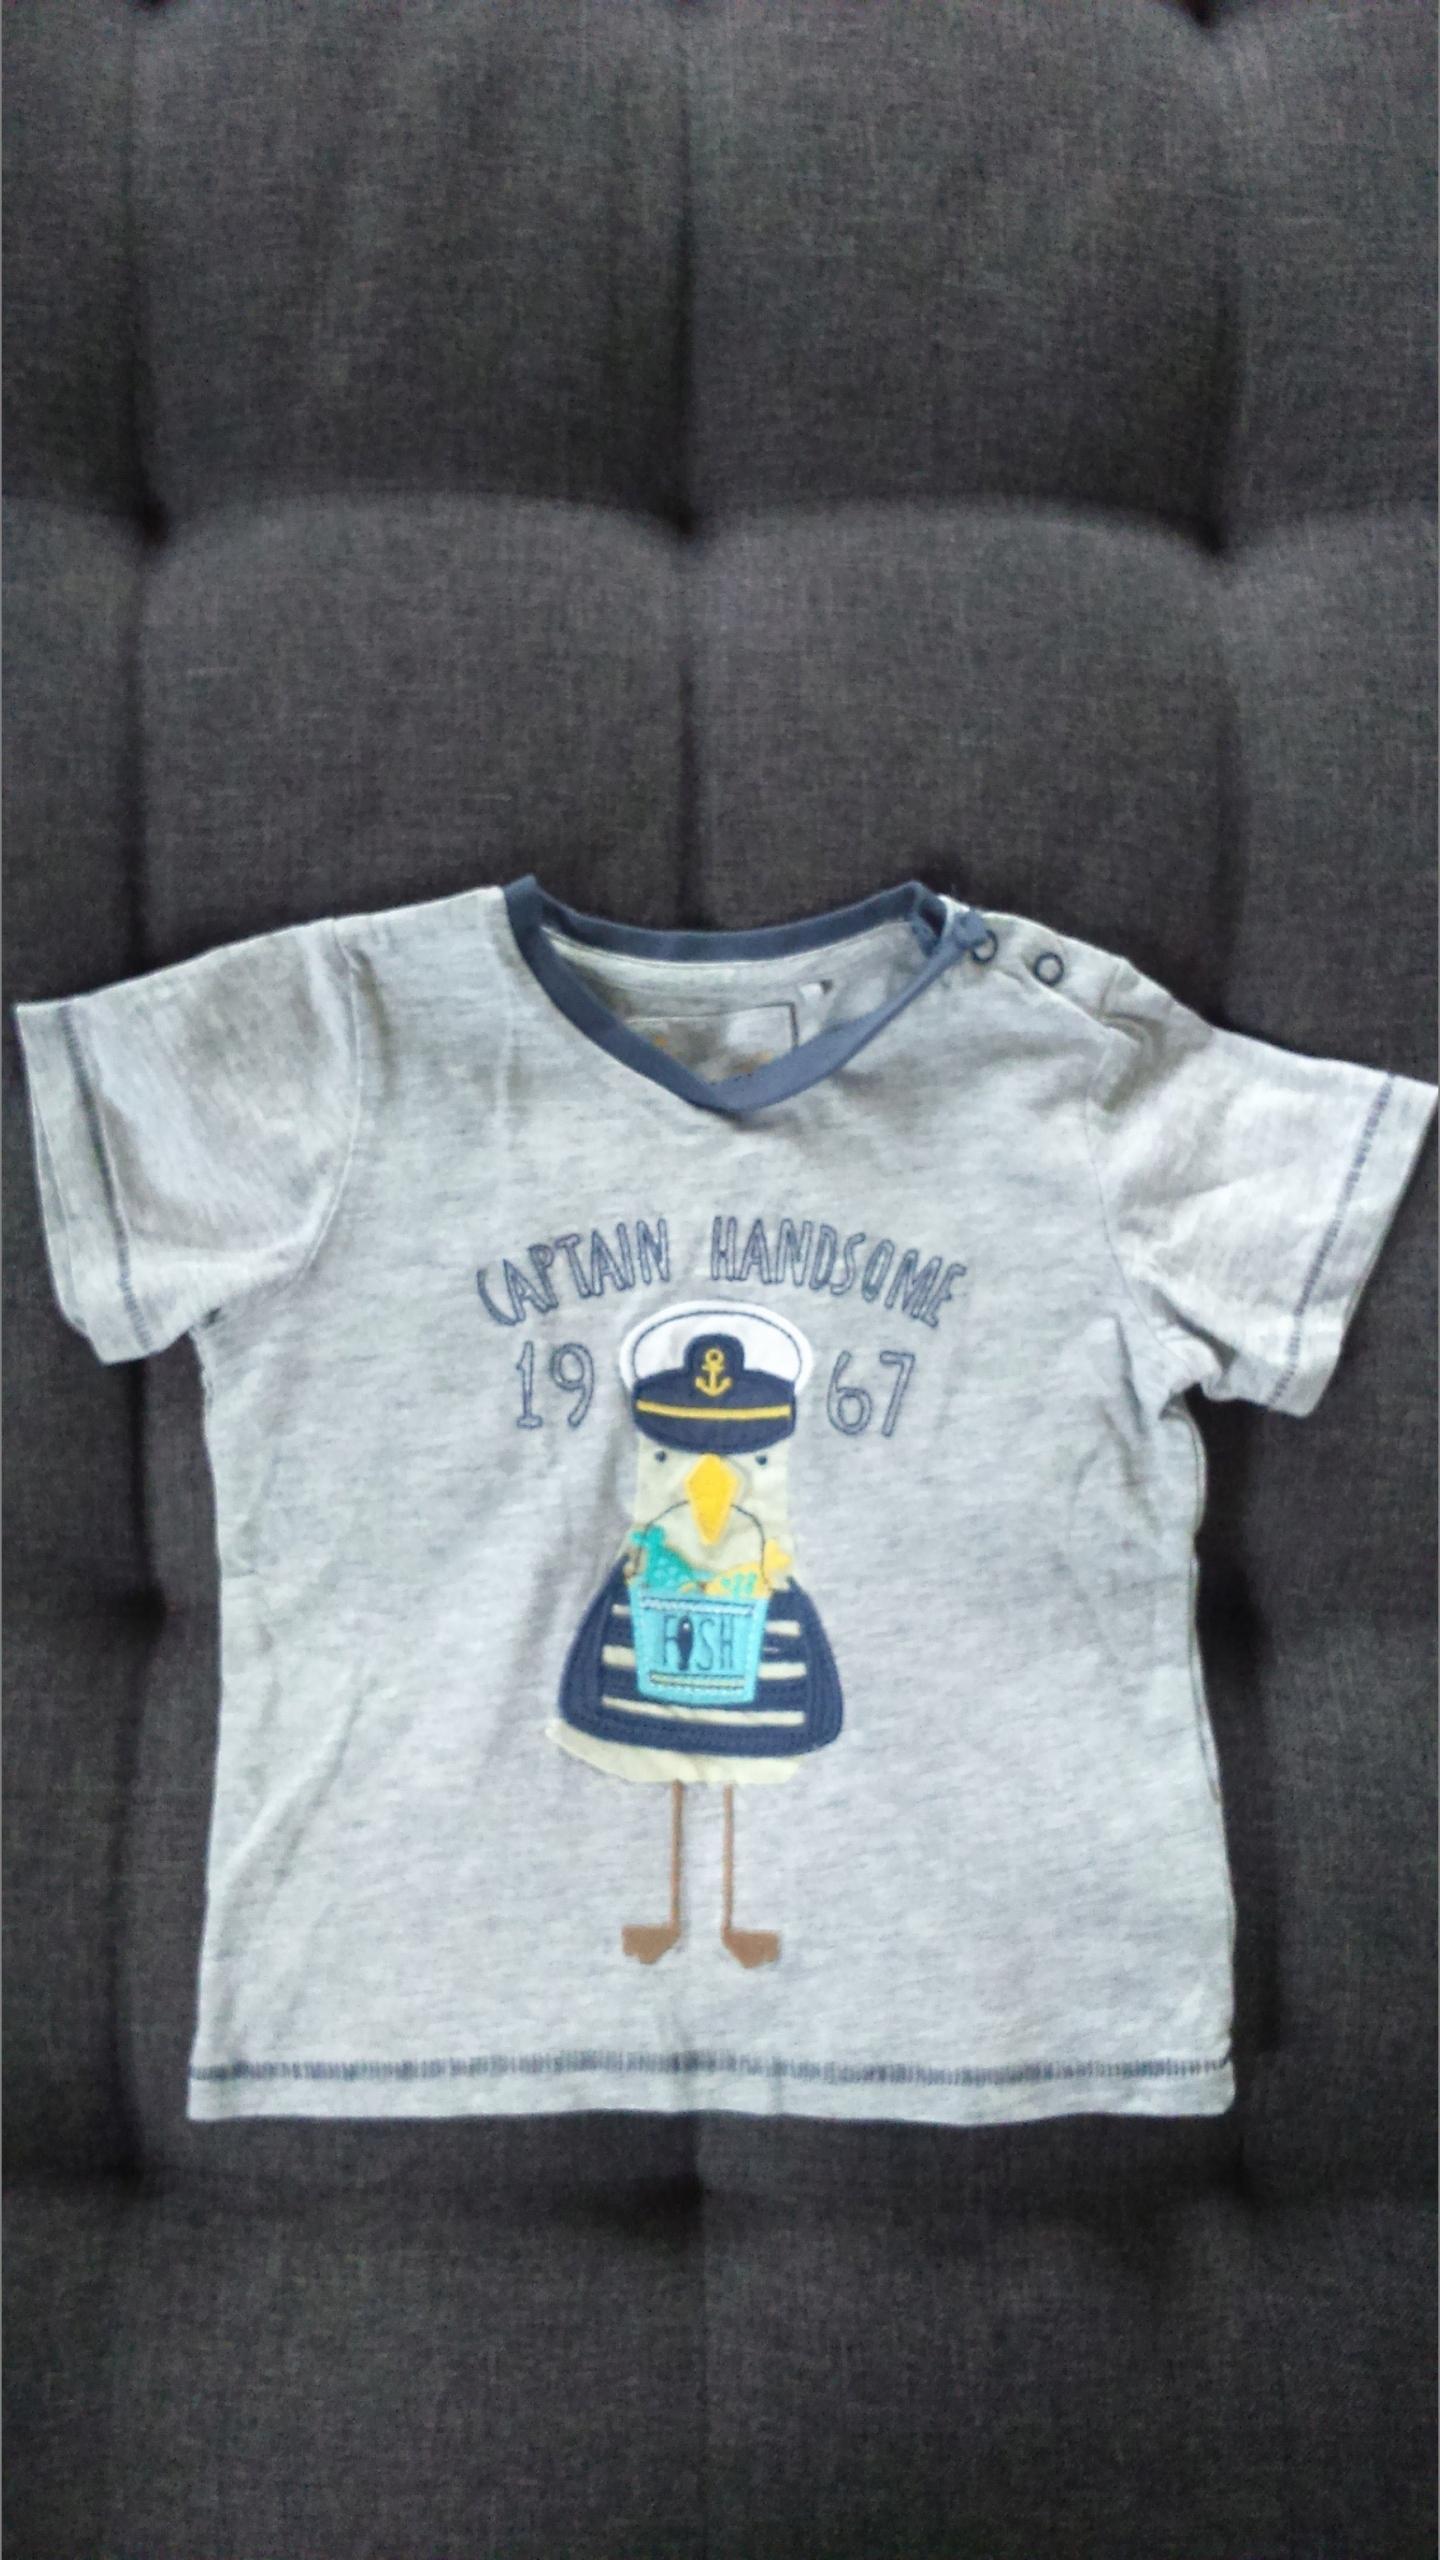 TU koszulka, t-shirt aplikacja r. 86, 12-18 m